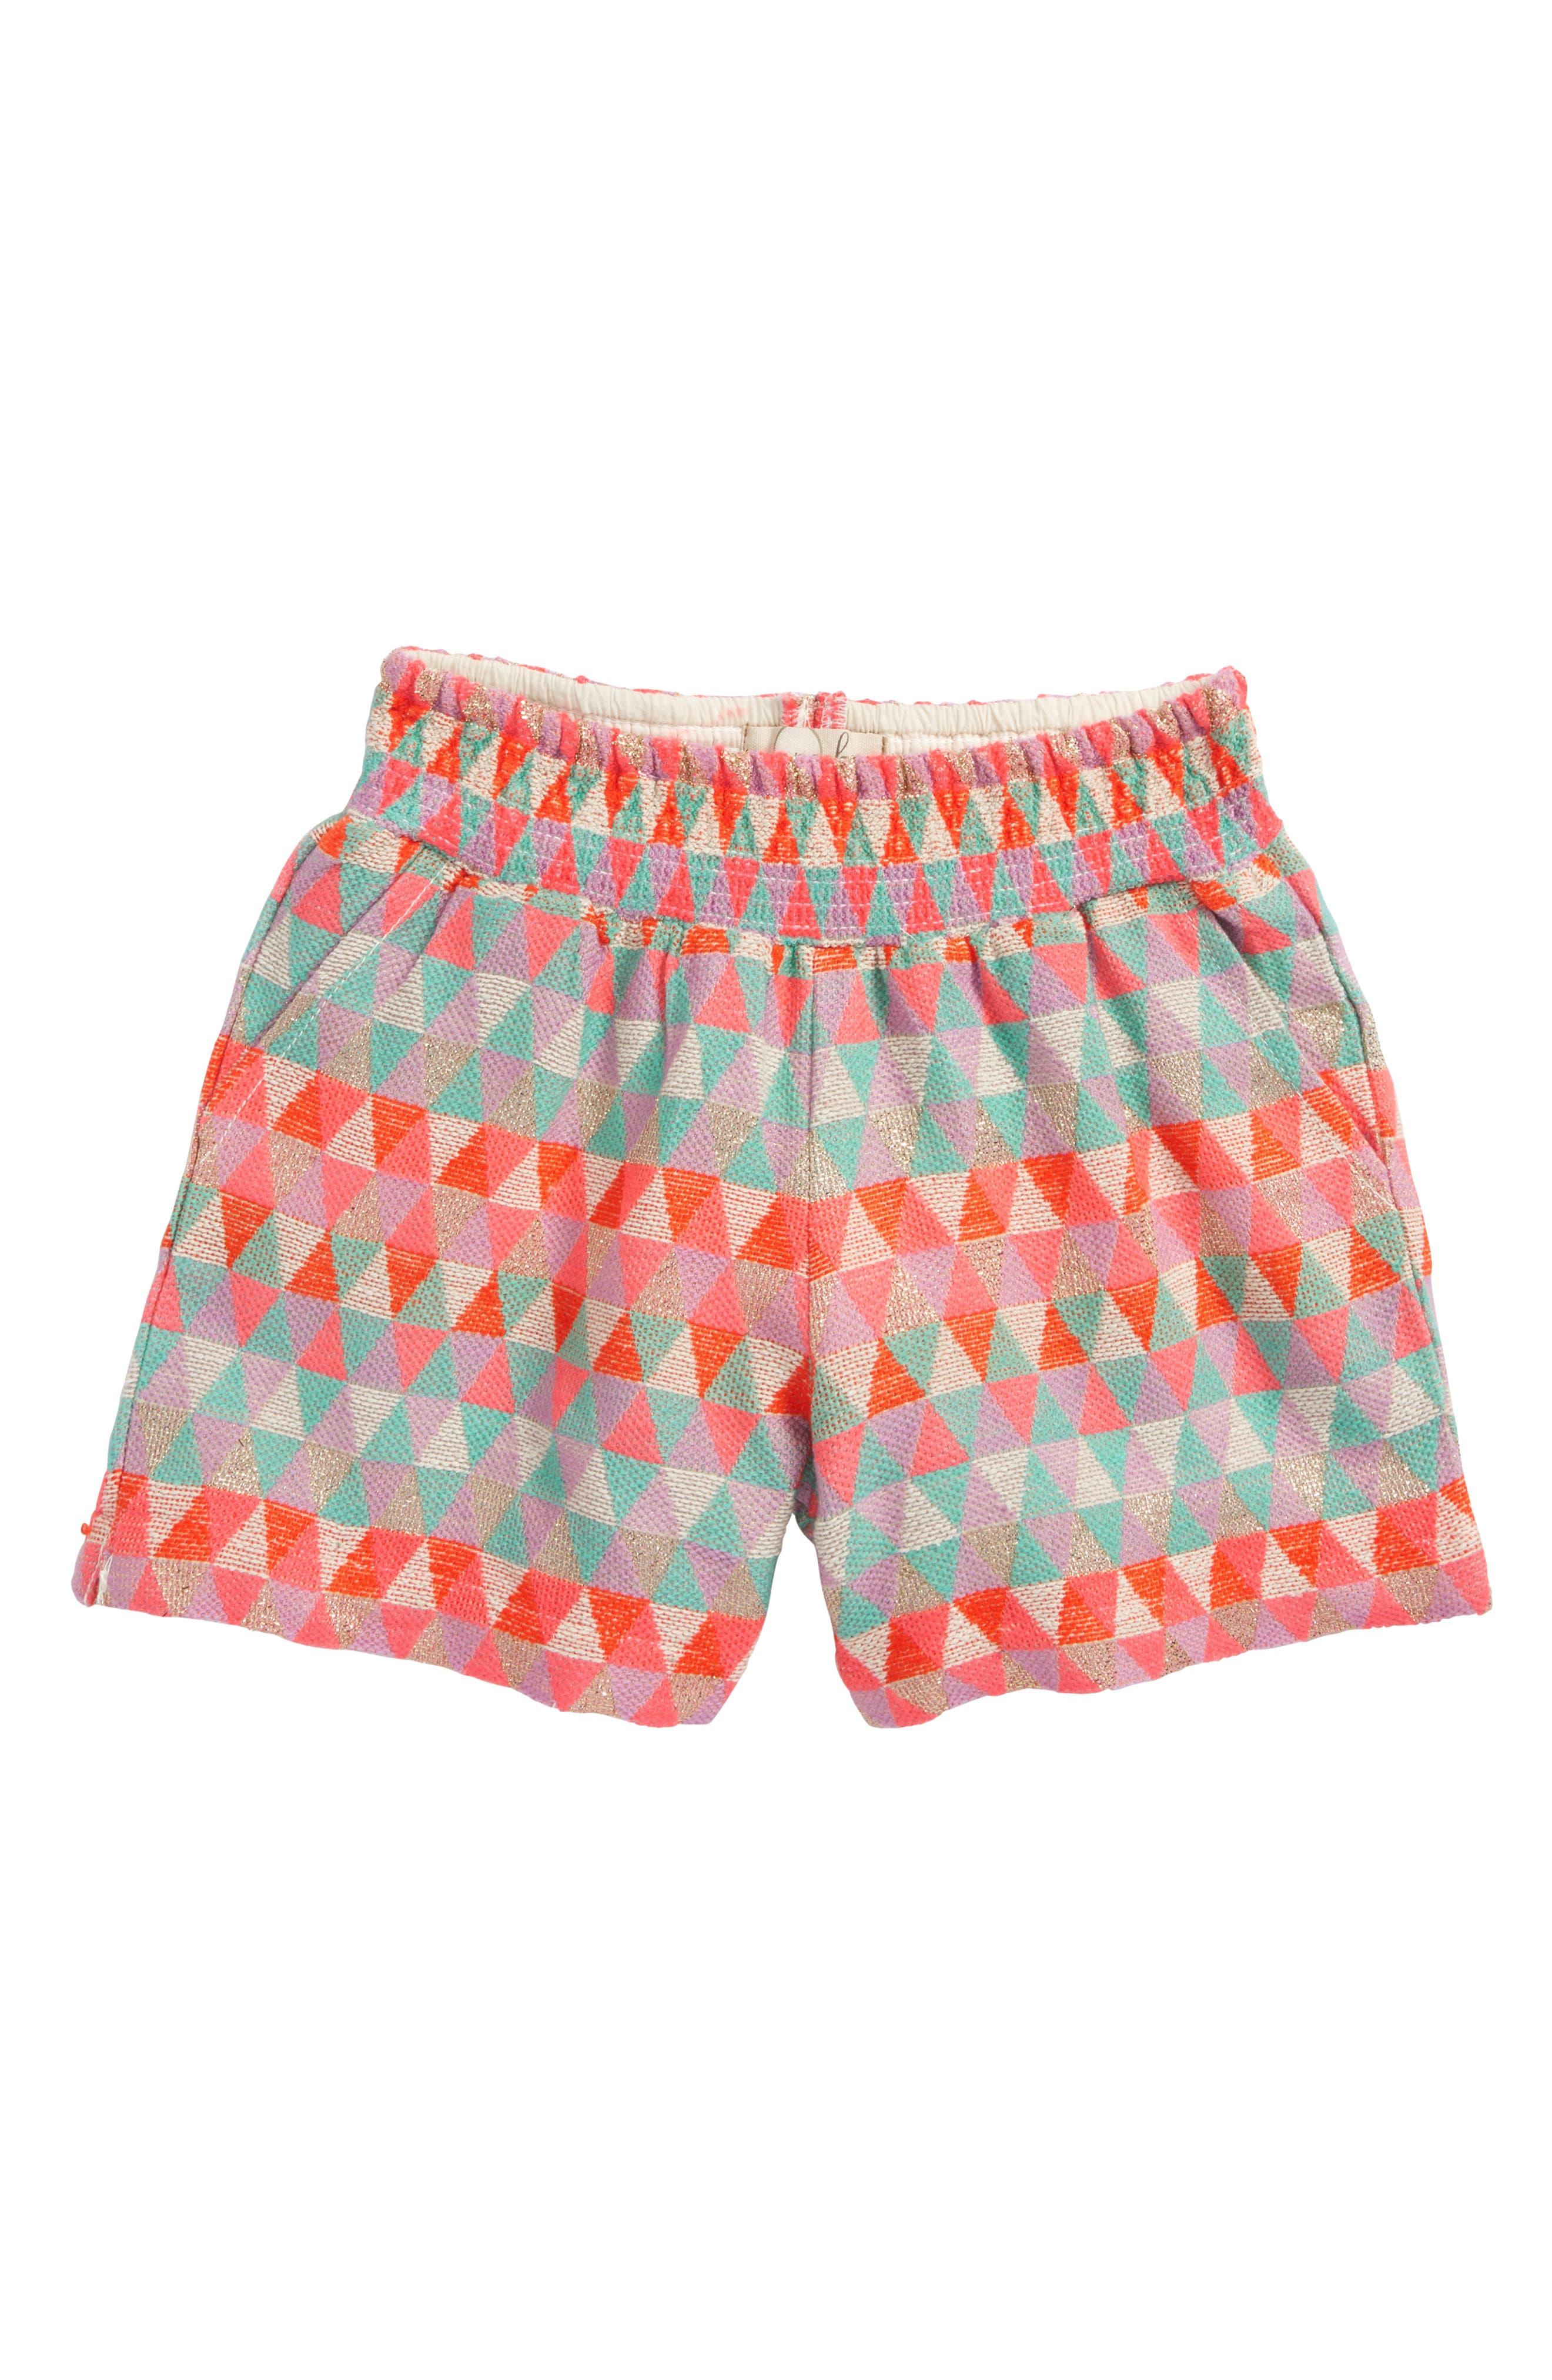 Mexico Shorts,                         Main,                         color, 950